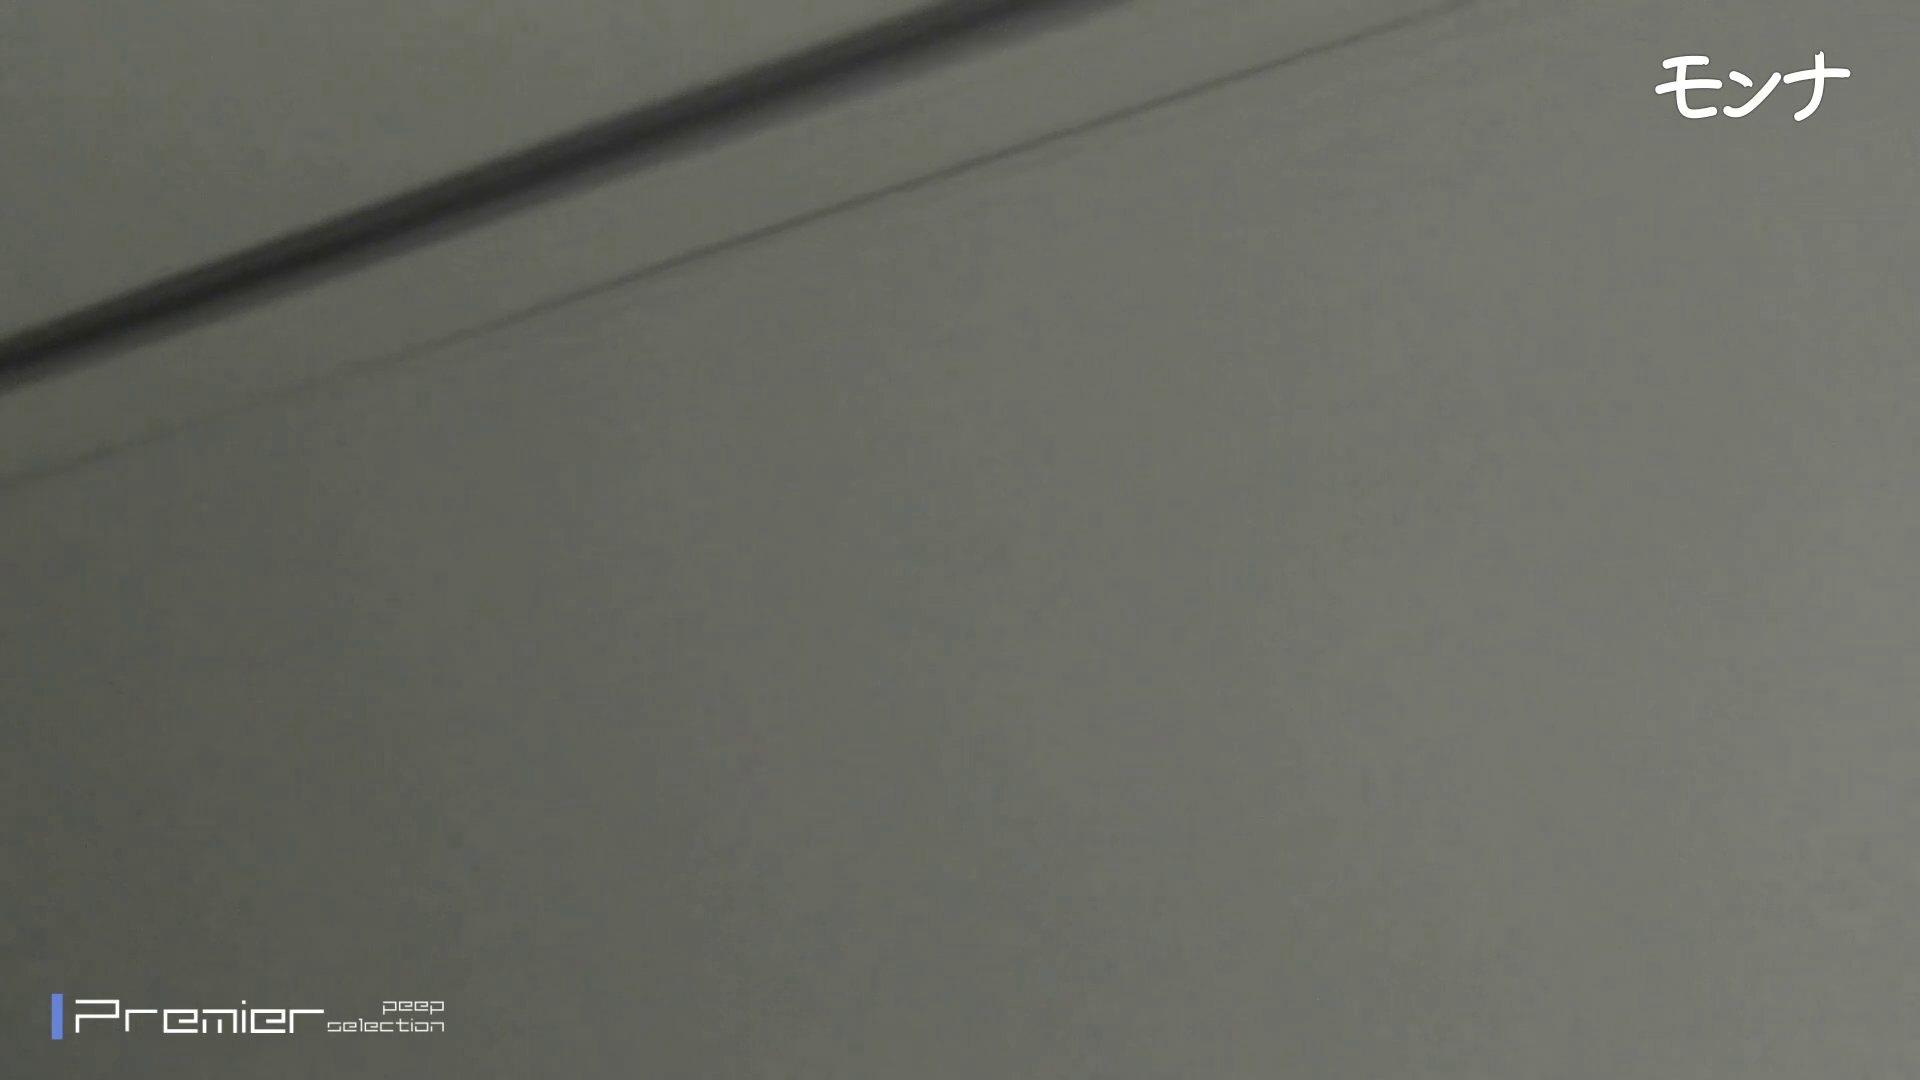 CM 清楚なお女市さんから流れる綺麗な聖水【美しい日本の未来 No.125】 高評価 AV無料動画キャプチャ 107枚 79